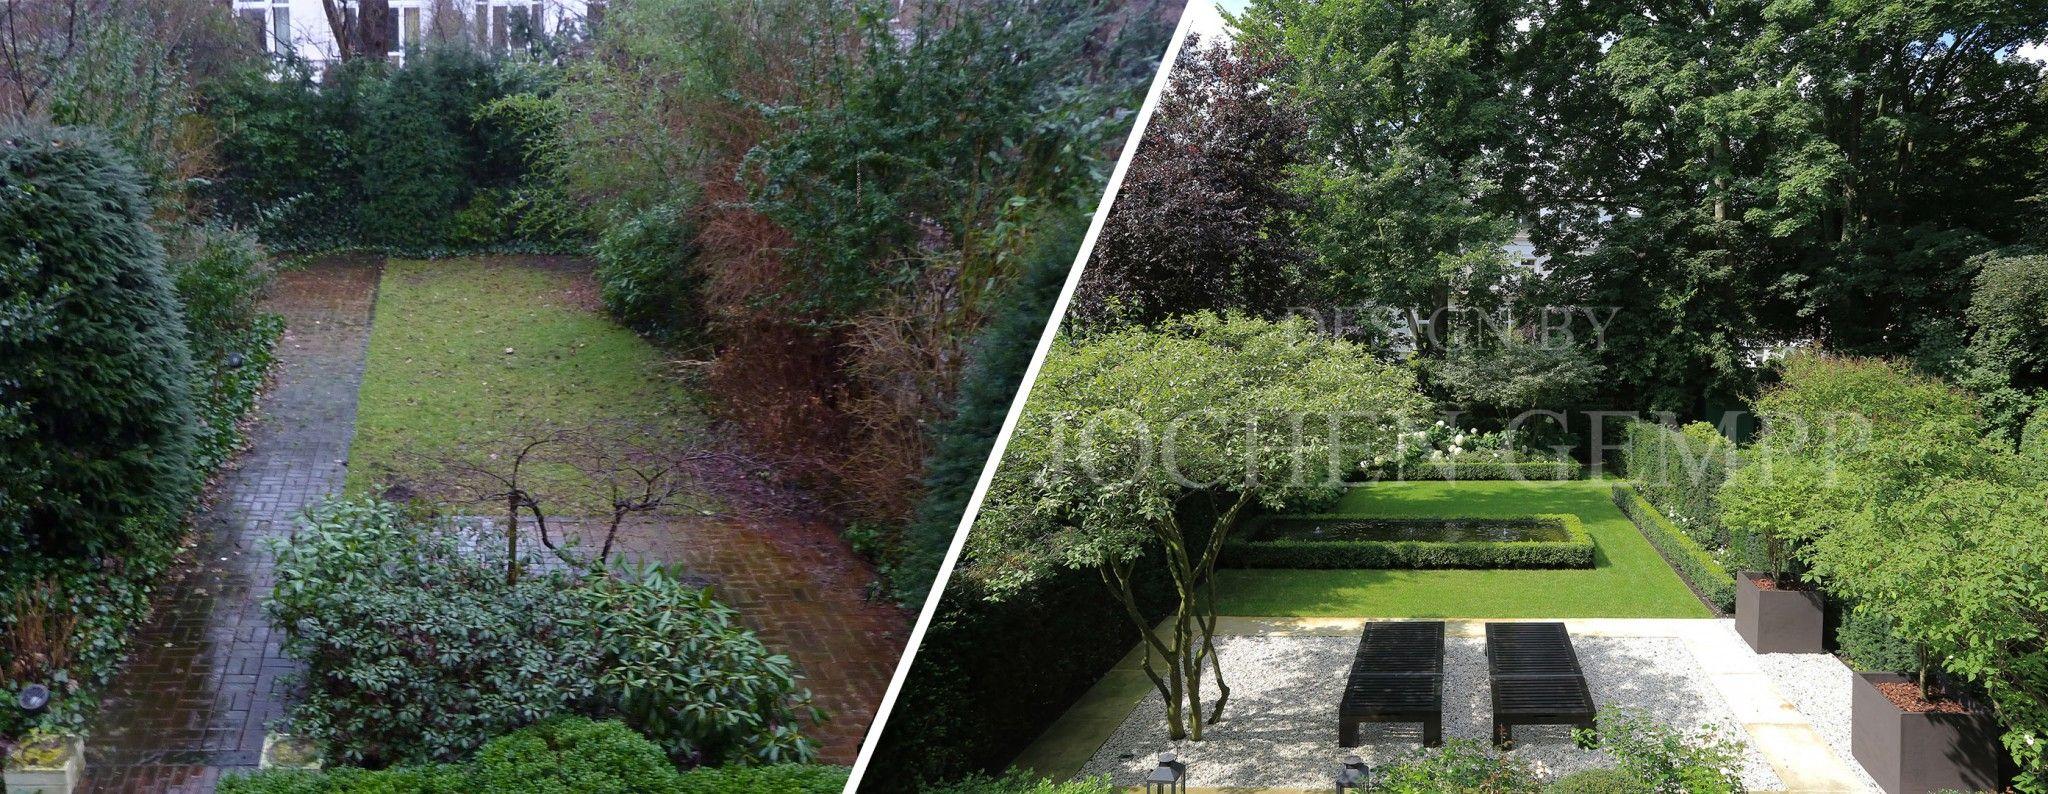 gartenplanung & gartengestaltung: vorher / nachher effekt, Gartenarbeit ideen